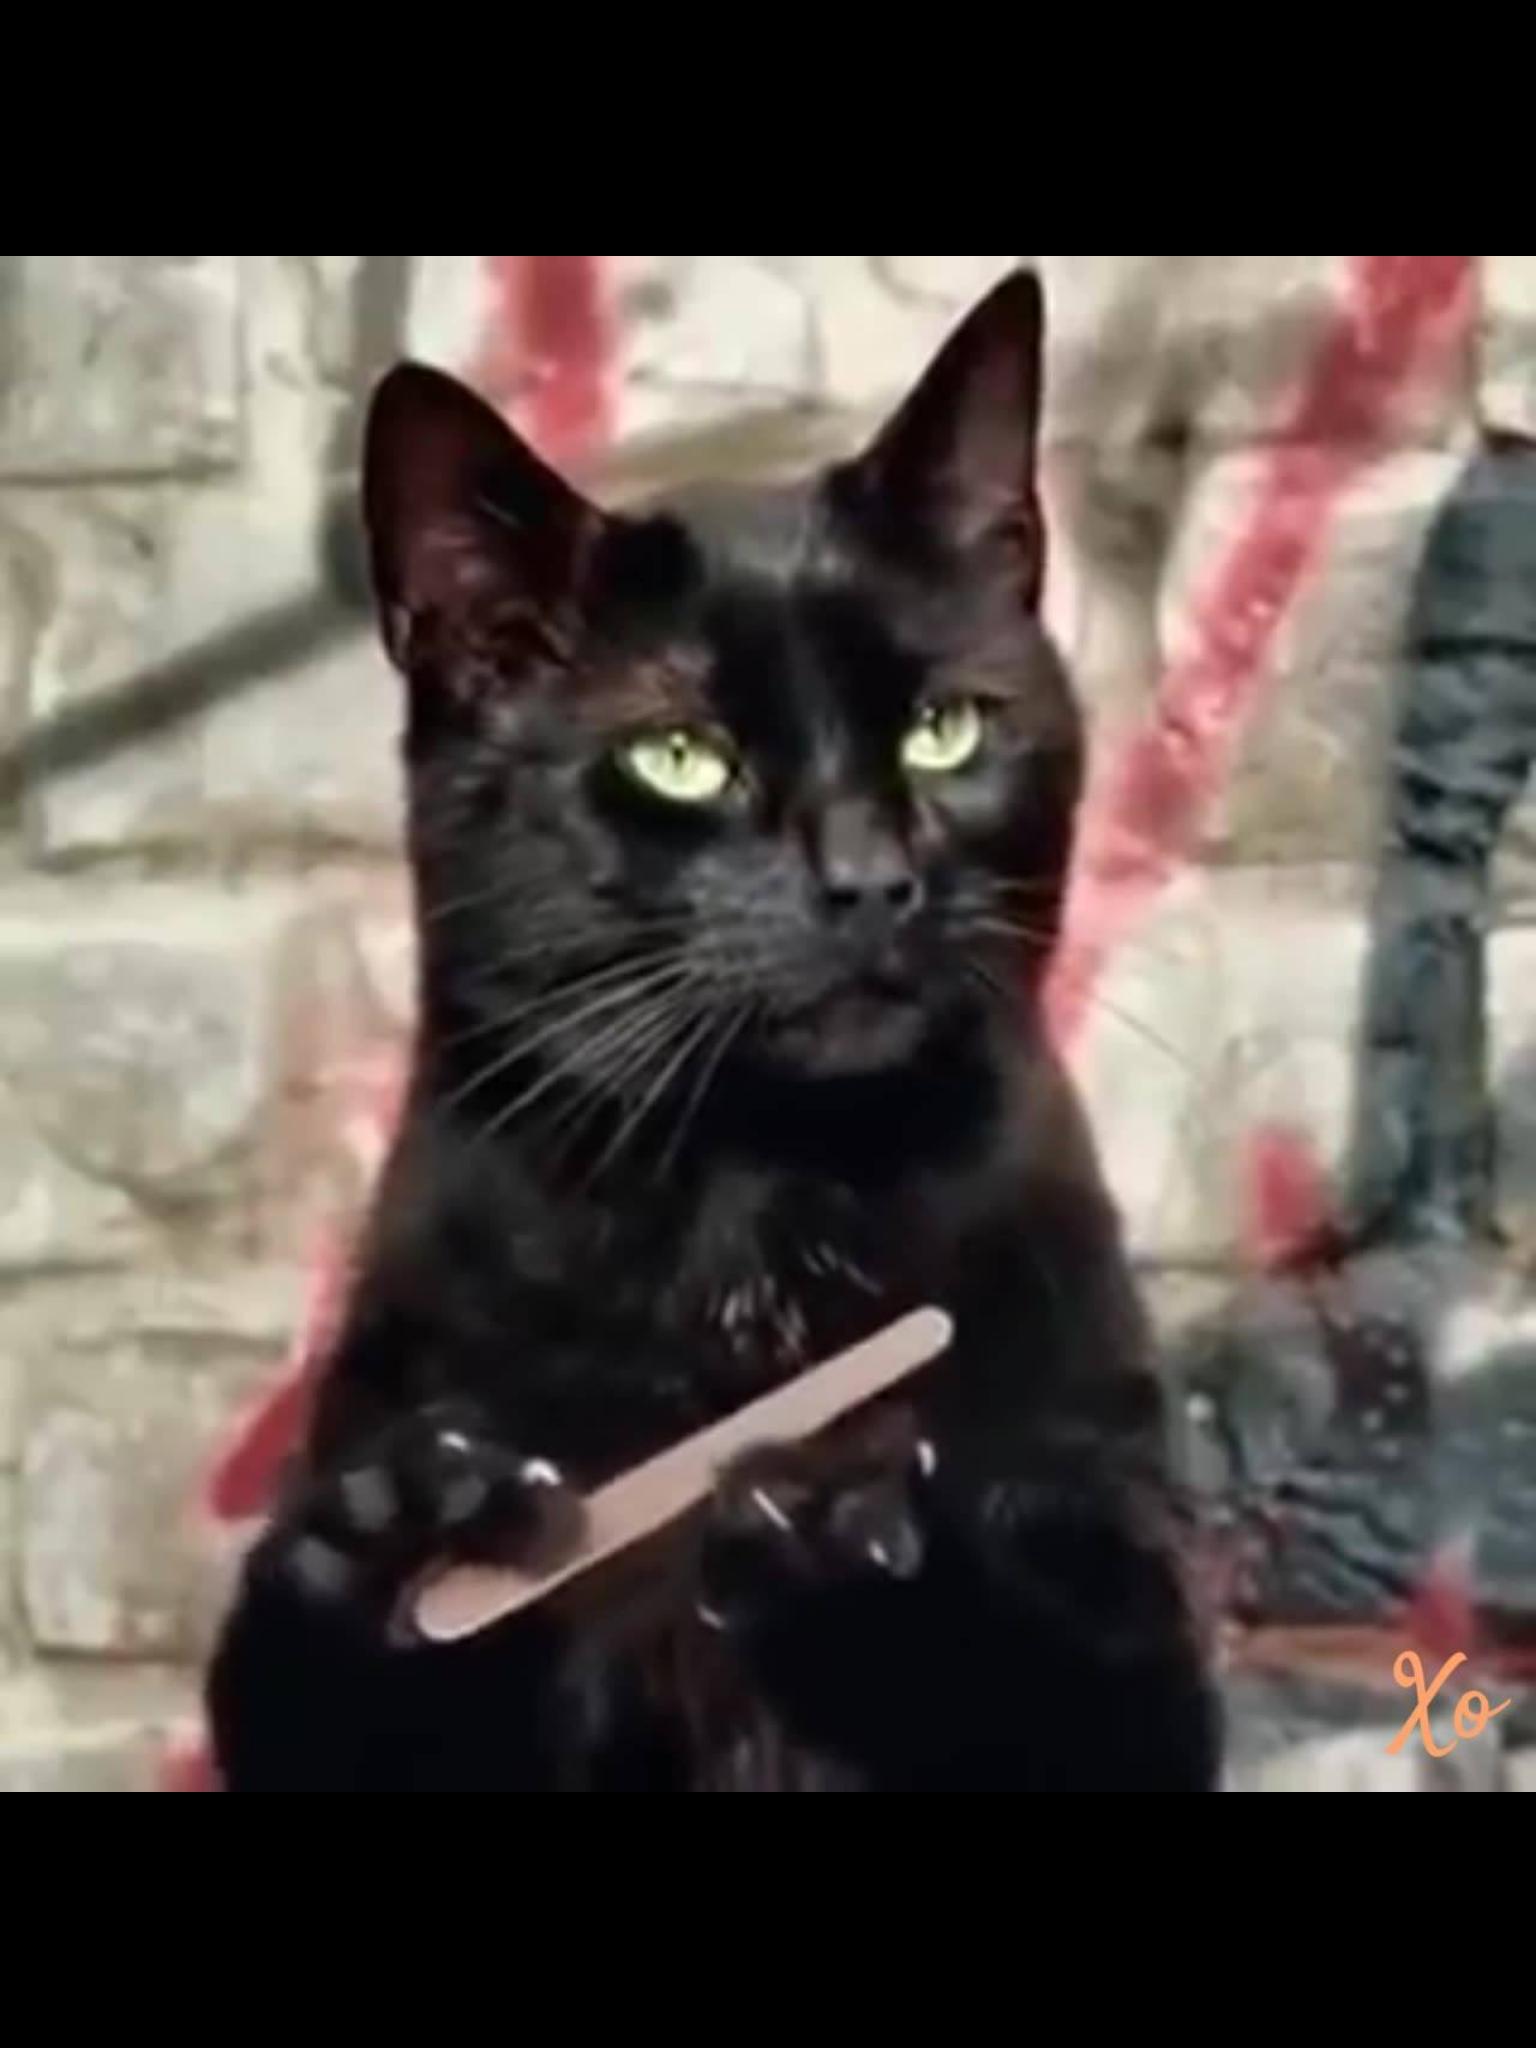 Black Cat Filing Nails : black, filing, nails, Renee, Witch, Cats,, Crazy, Memes